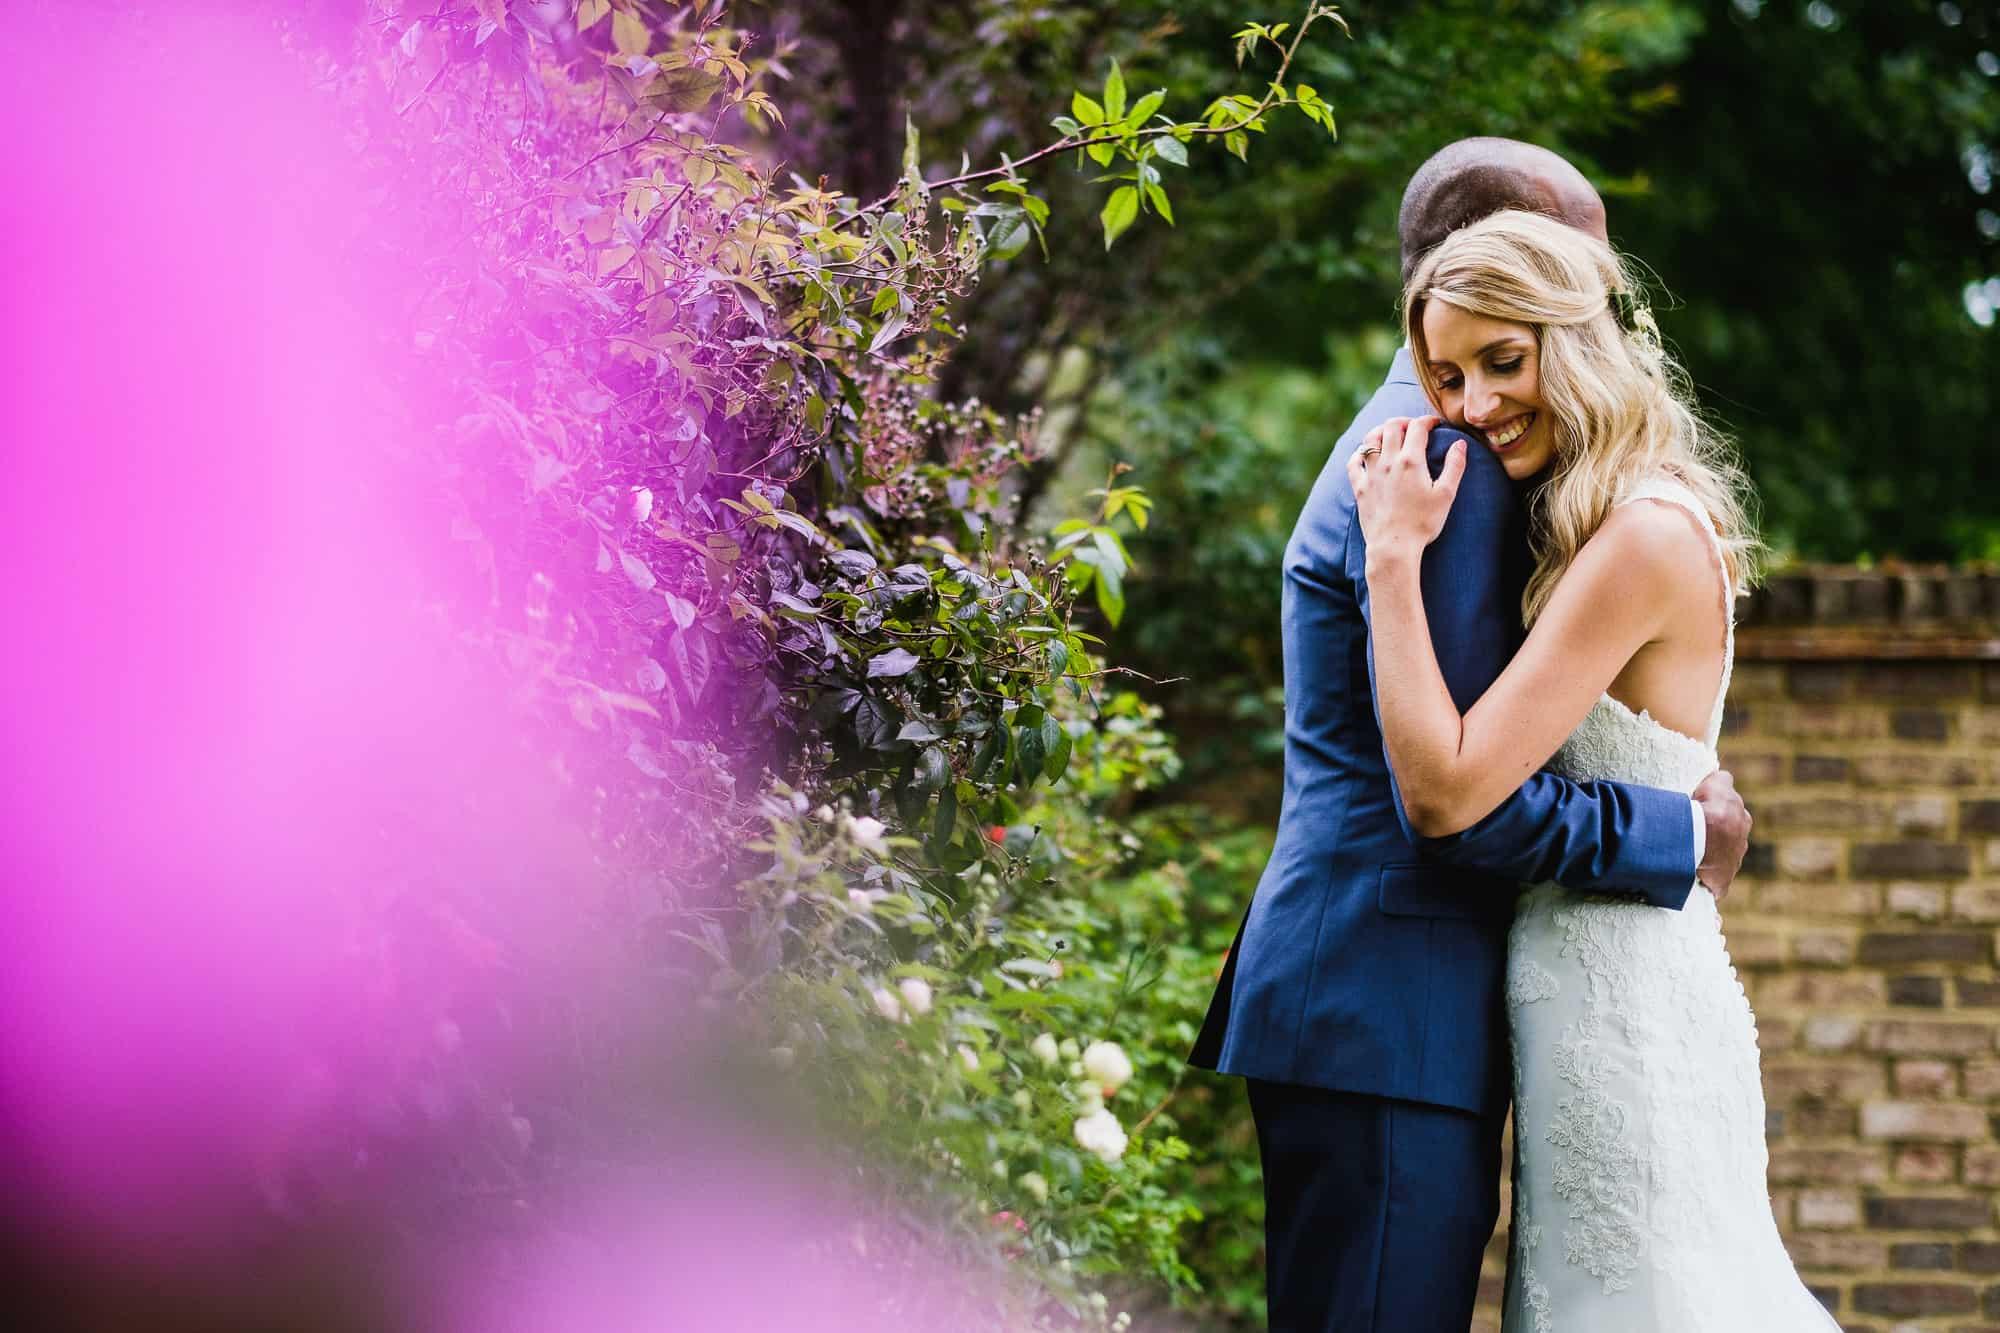 marleybrook-house-wedding-photography-matt-tyler-0041